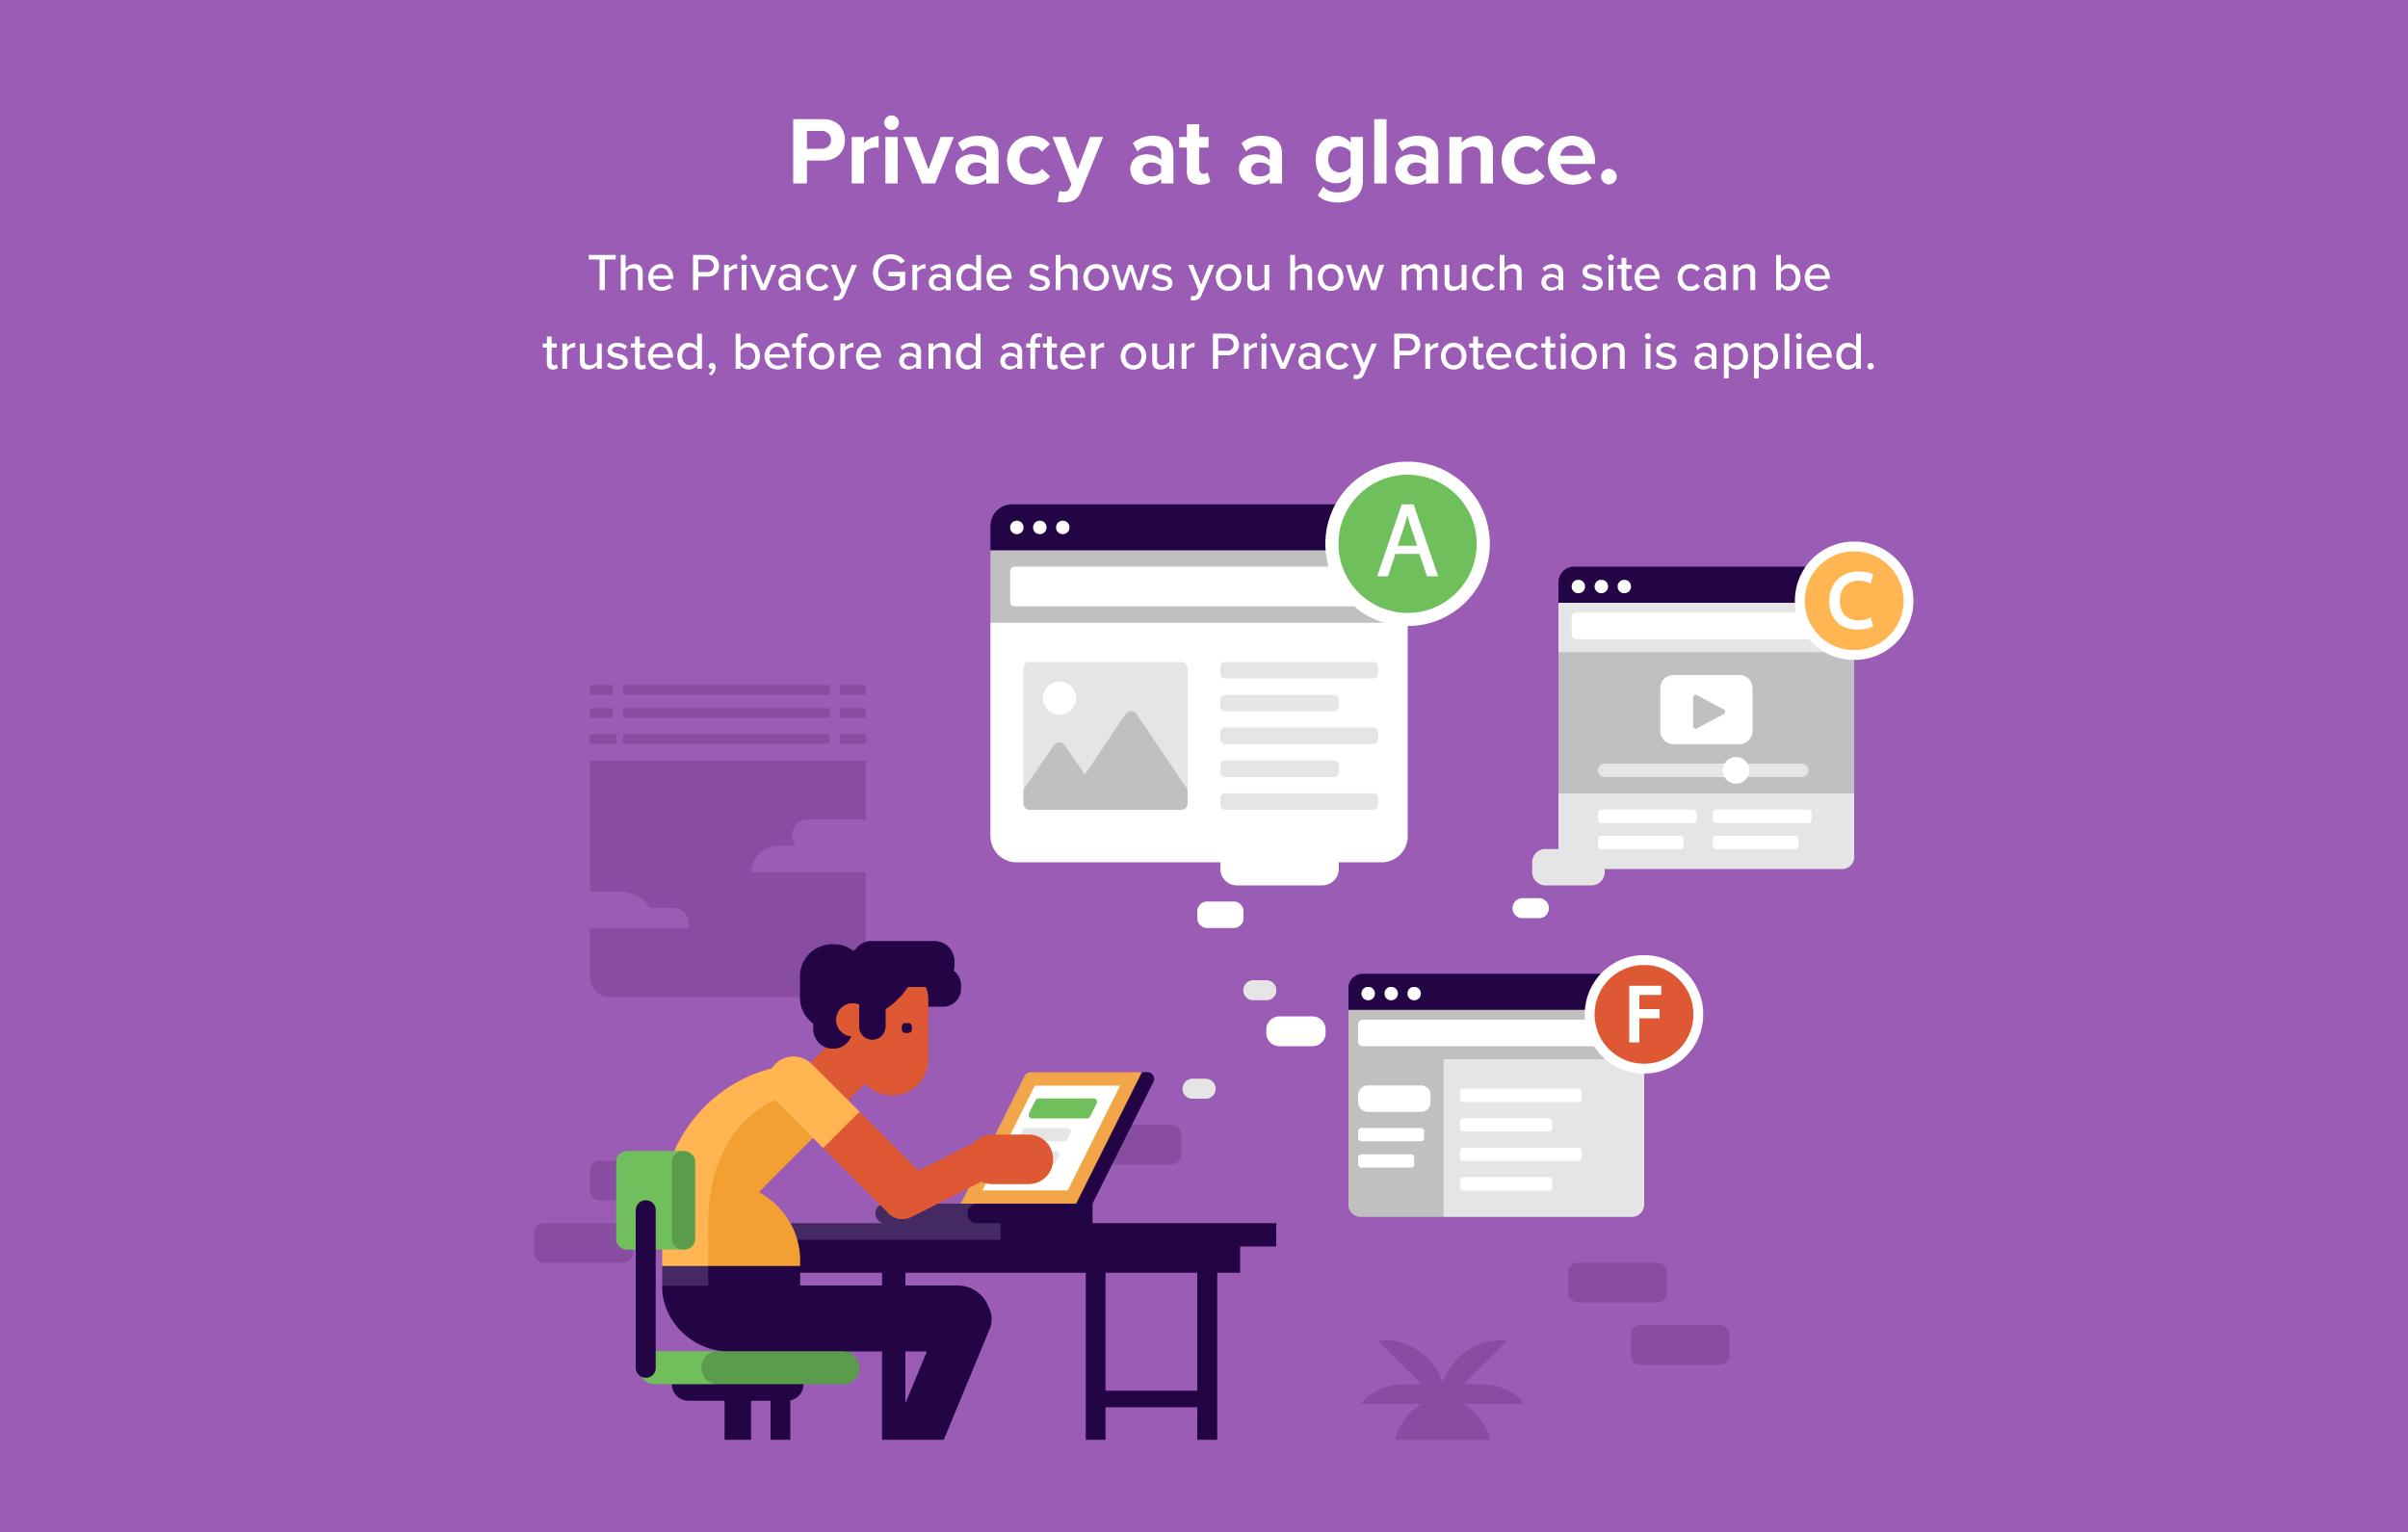 Matt Anderson DuckDuckGo character scenes. Privacy grades.